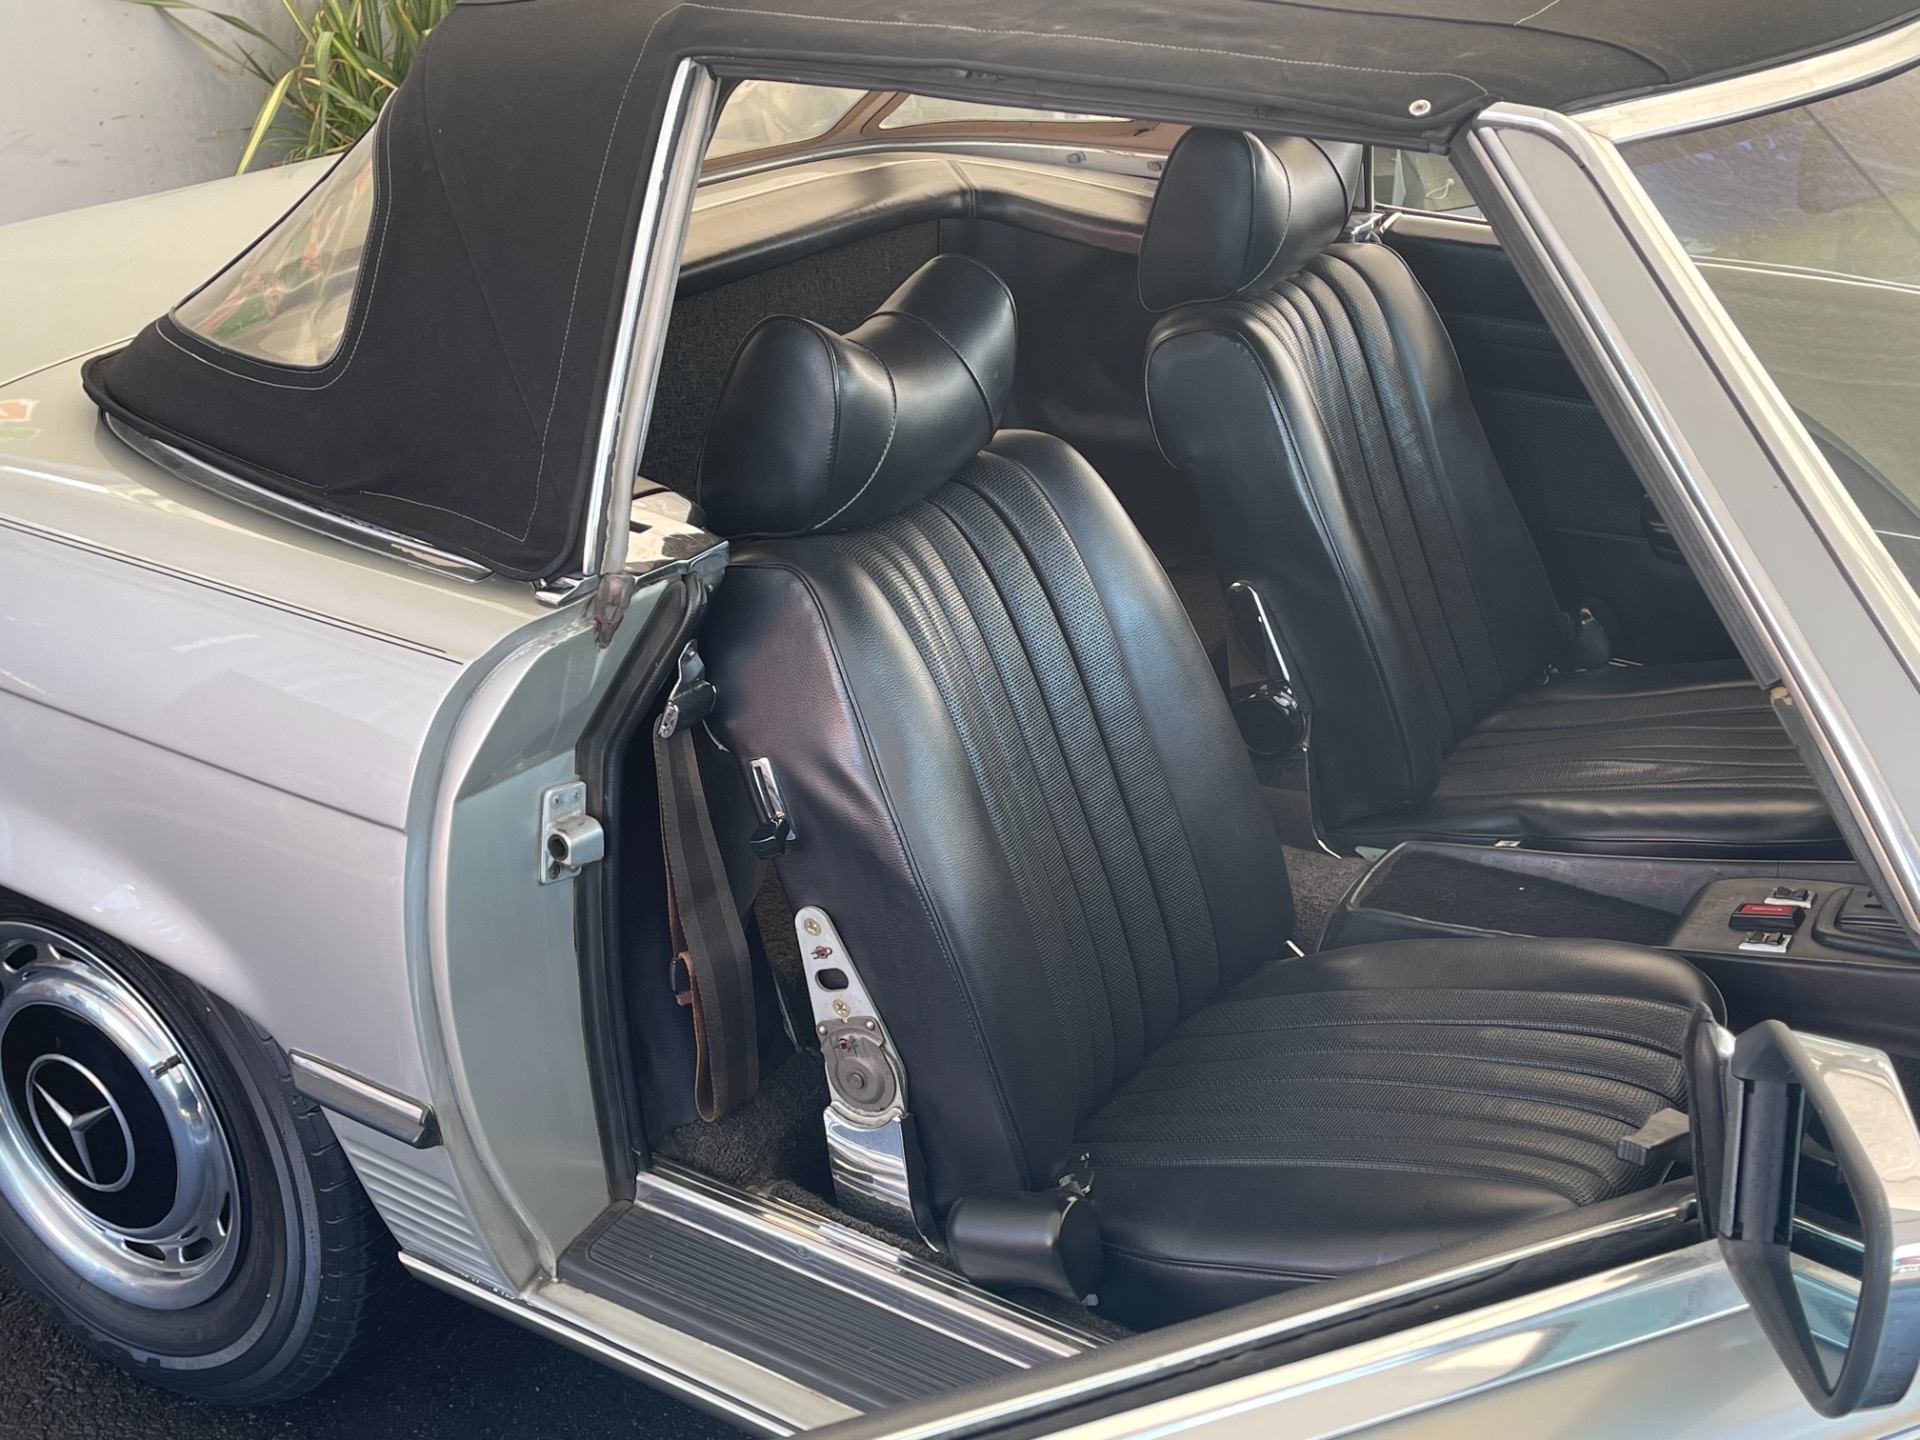 Used 1972 MERCEDES BENZ 450sl